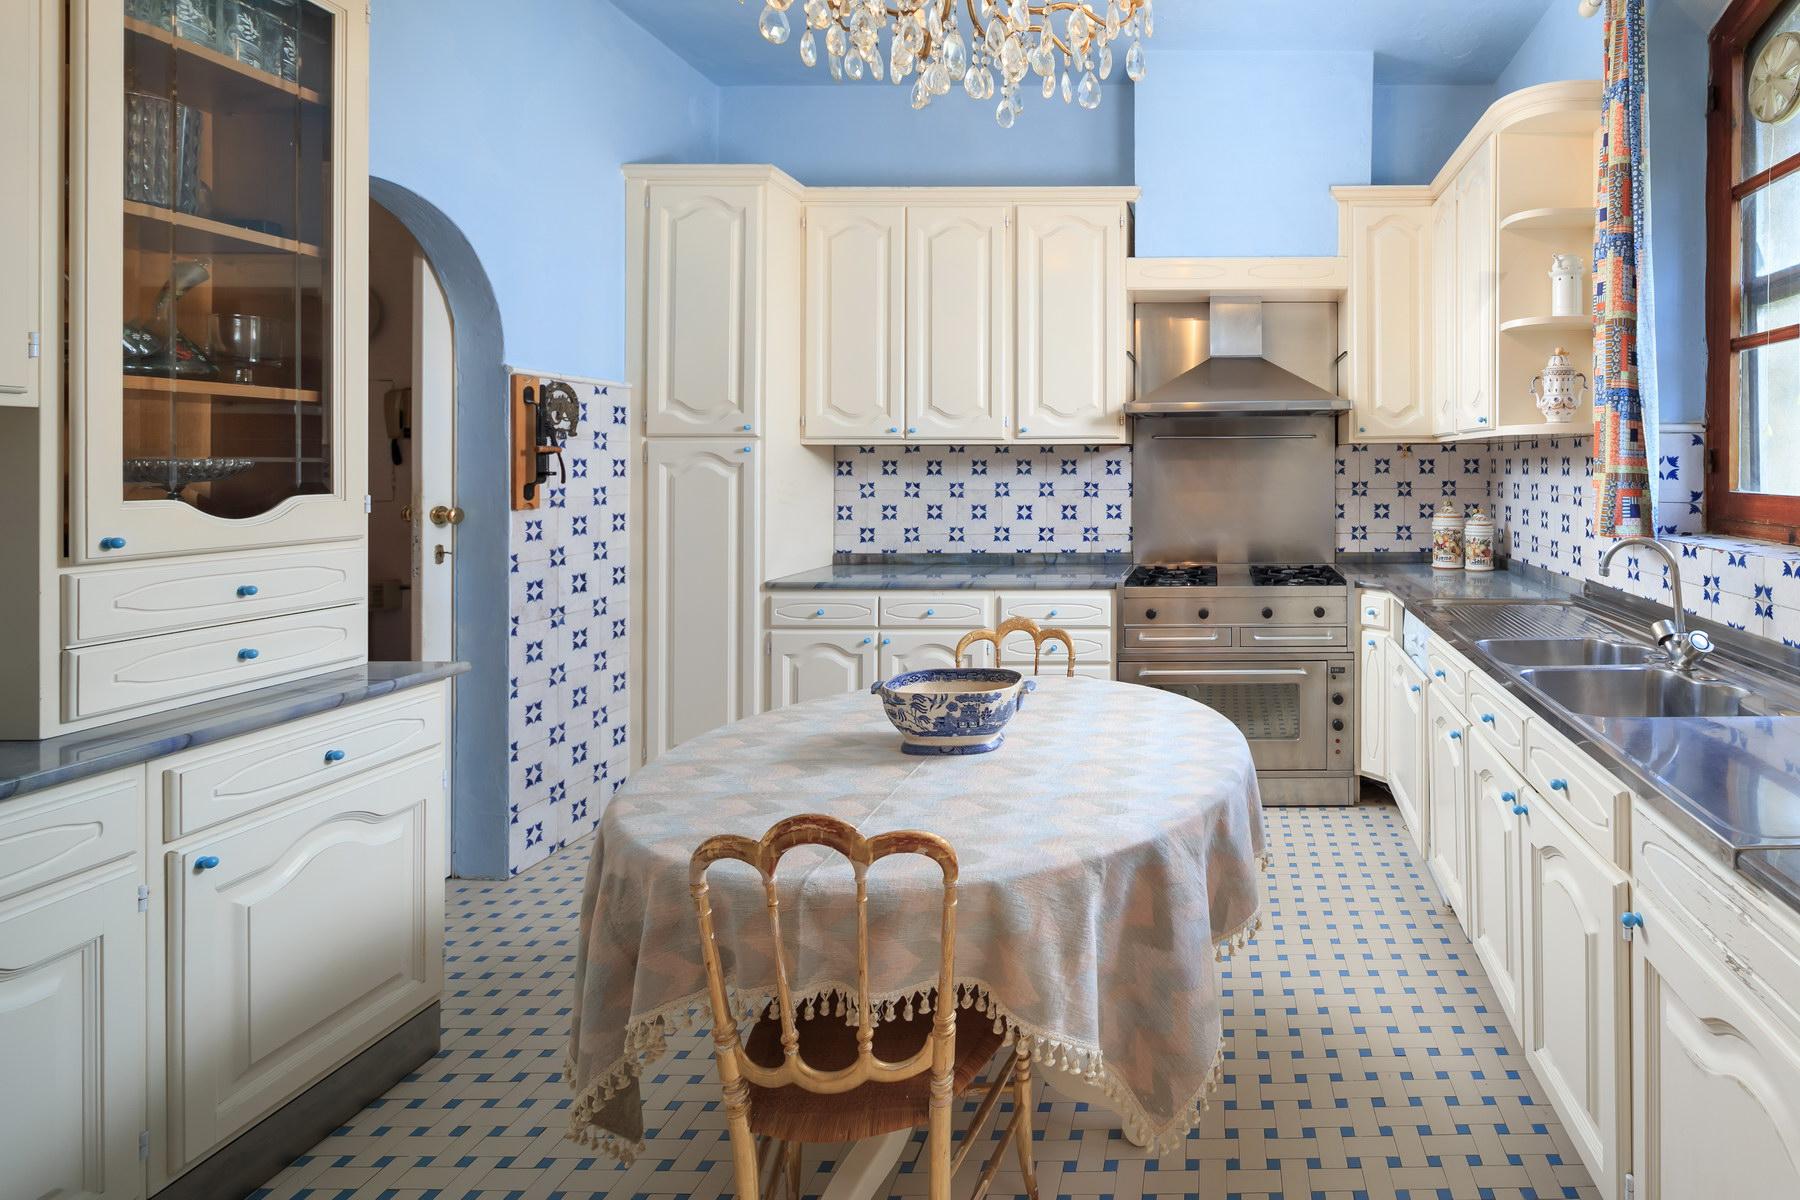 Villa in Vendita a Lerici: 5 locali, 620 mq - Foto 12